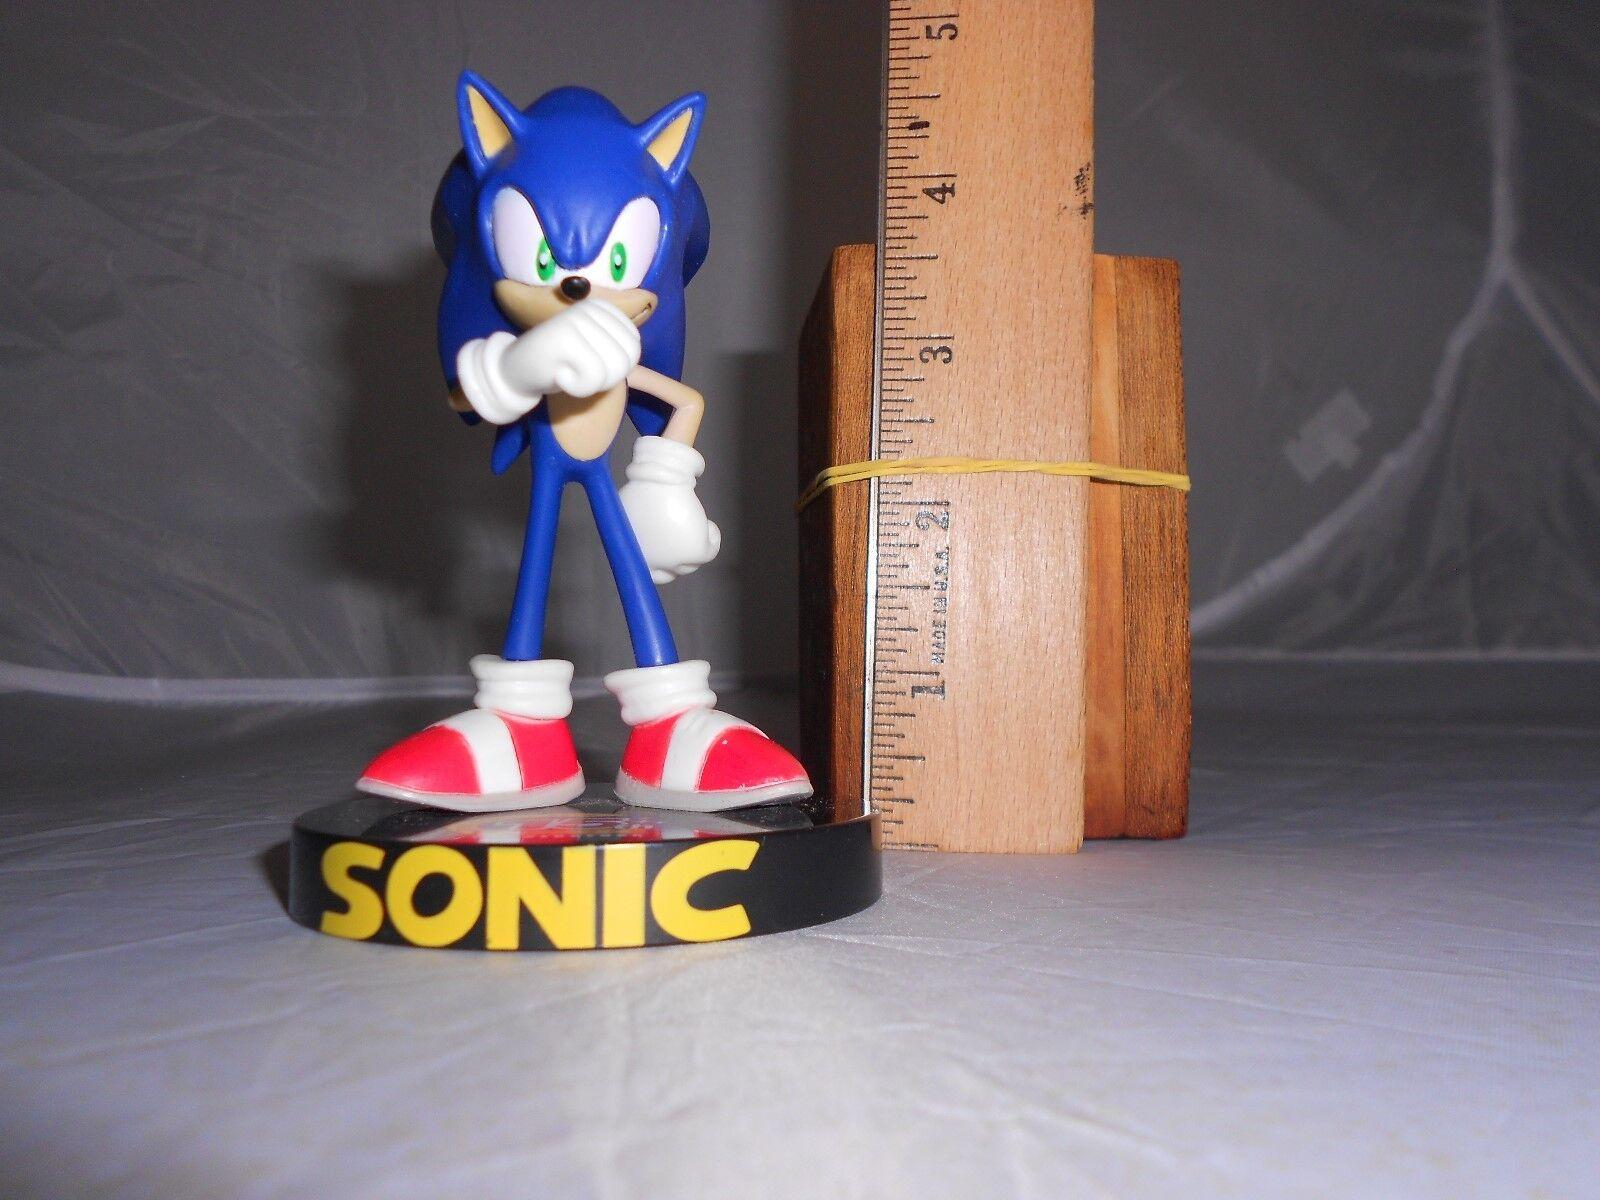 Sonic the Hedgehog 15th Anniversary Figure Statue Promo Sega Games